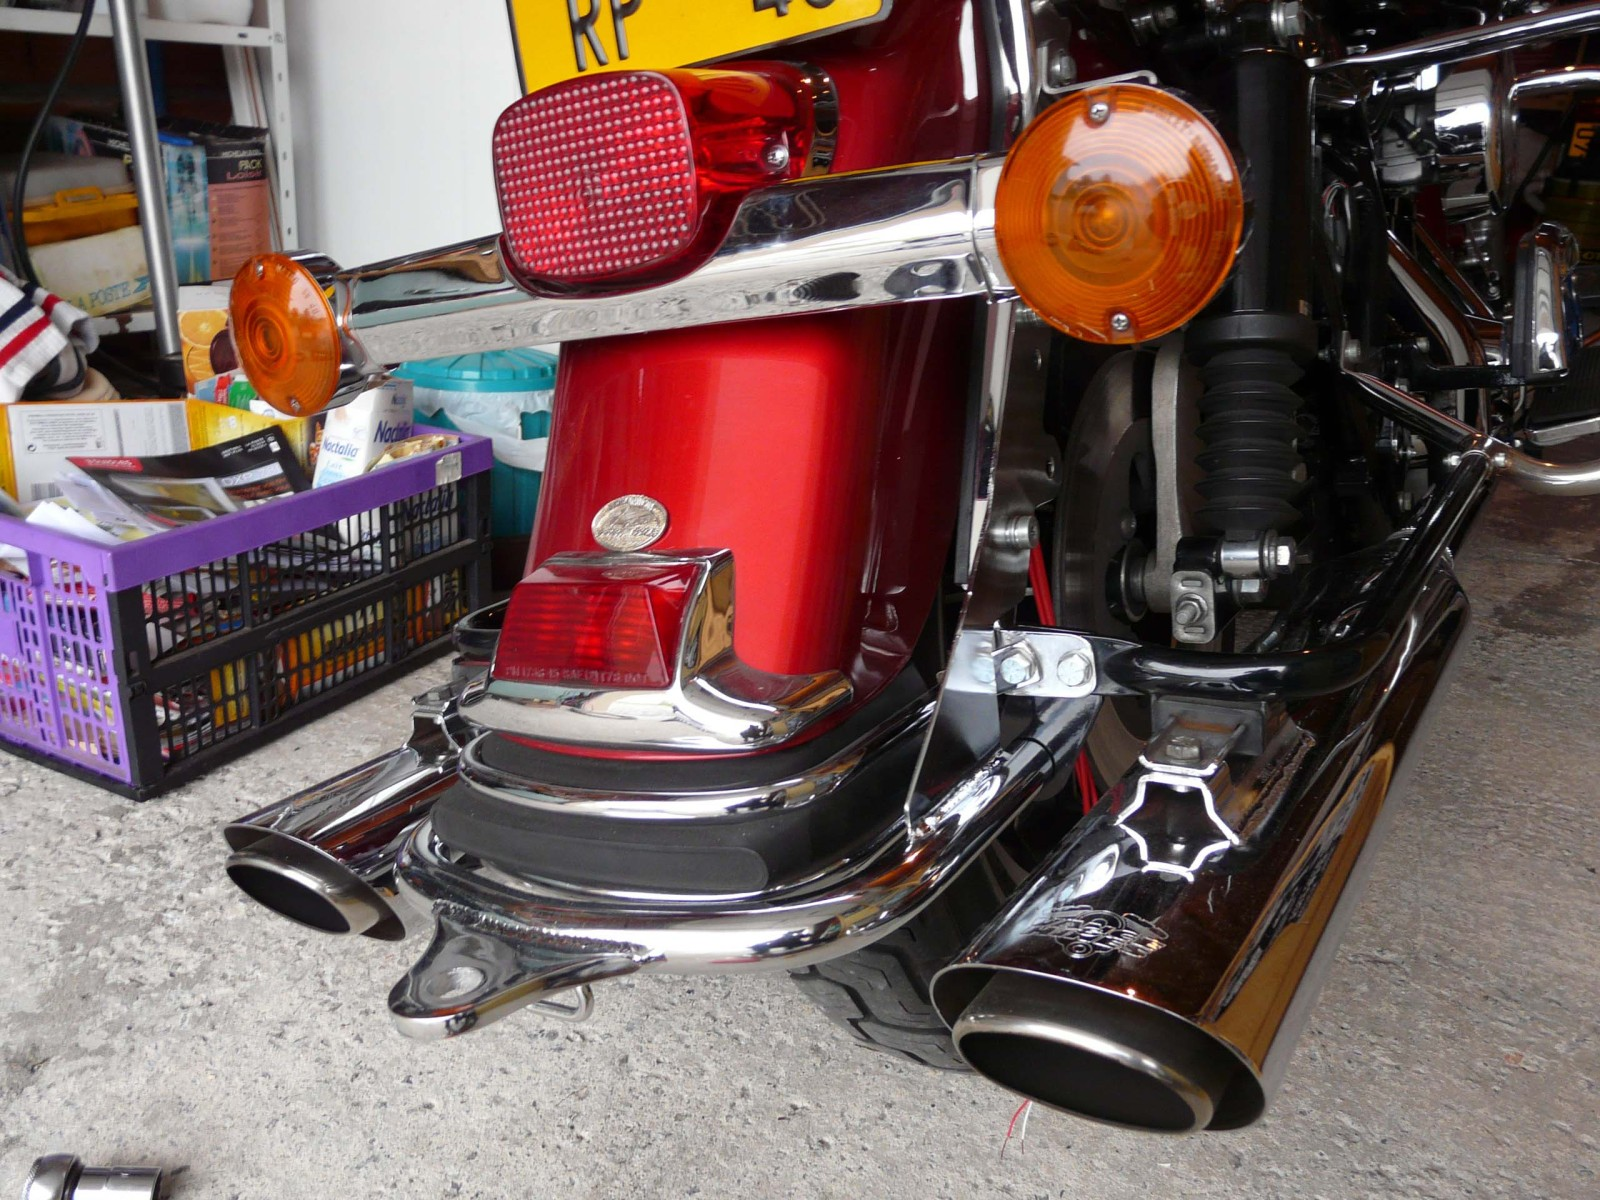 monter une boule de remorquage attelage sur une harley davidson road king 1340 kaz biker. Black Bedroom Furniture Sets. Home Design Ideas